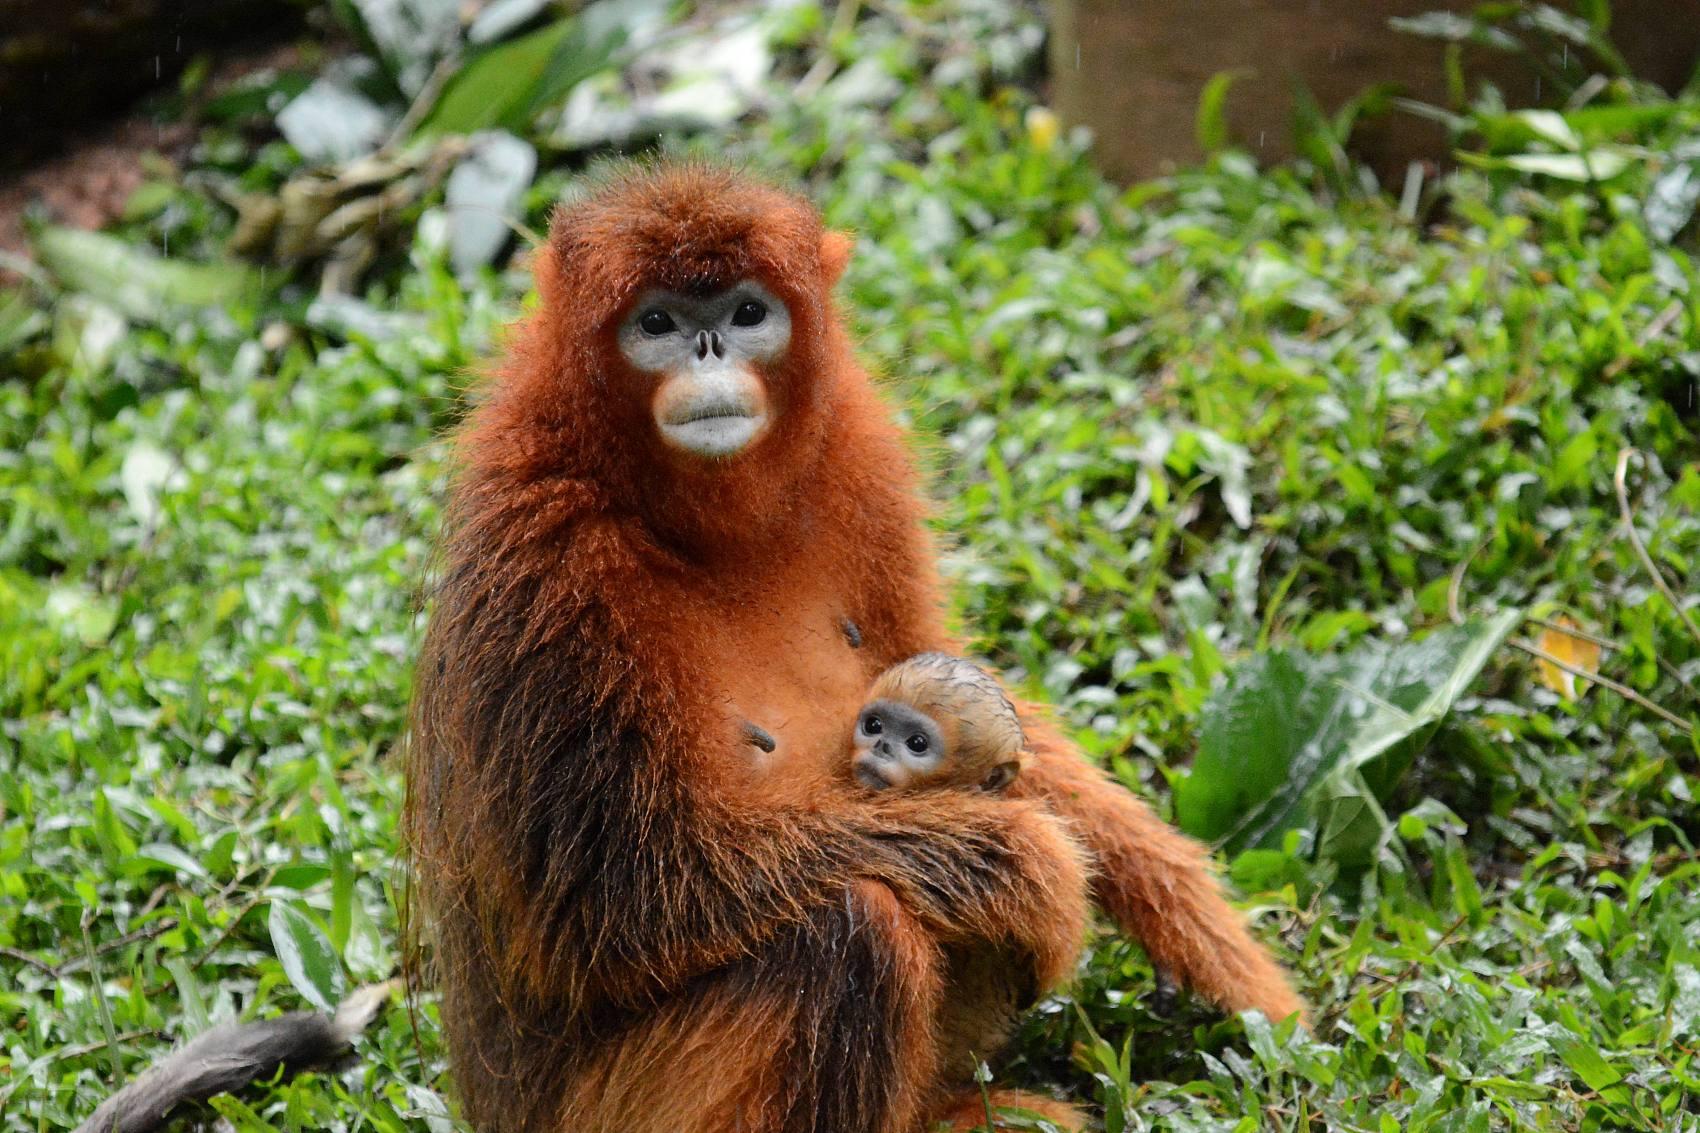 Face recognition tech for golden monkeys under development